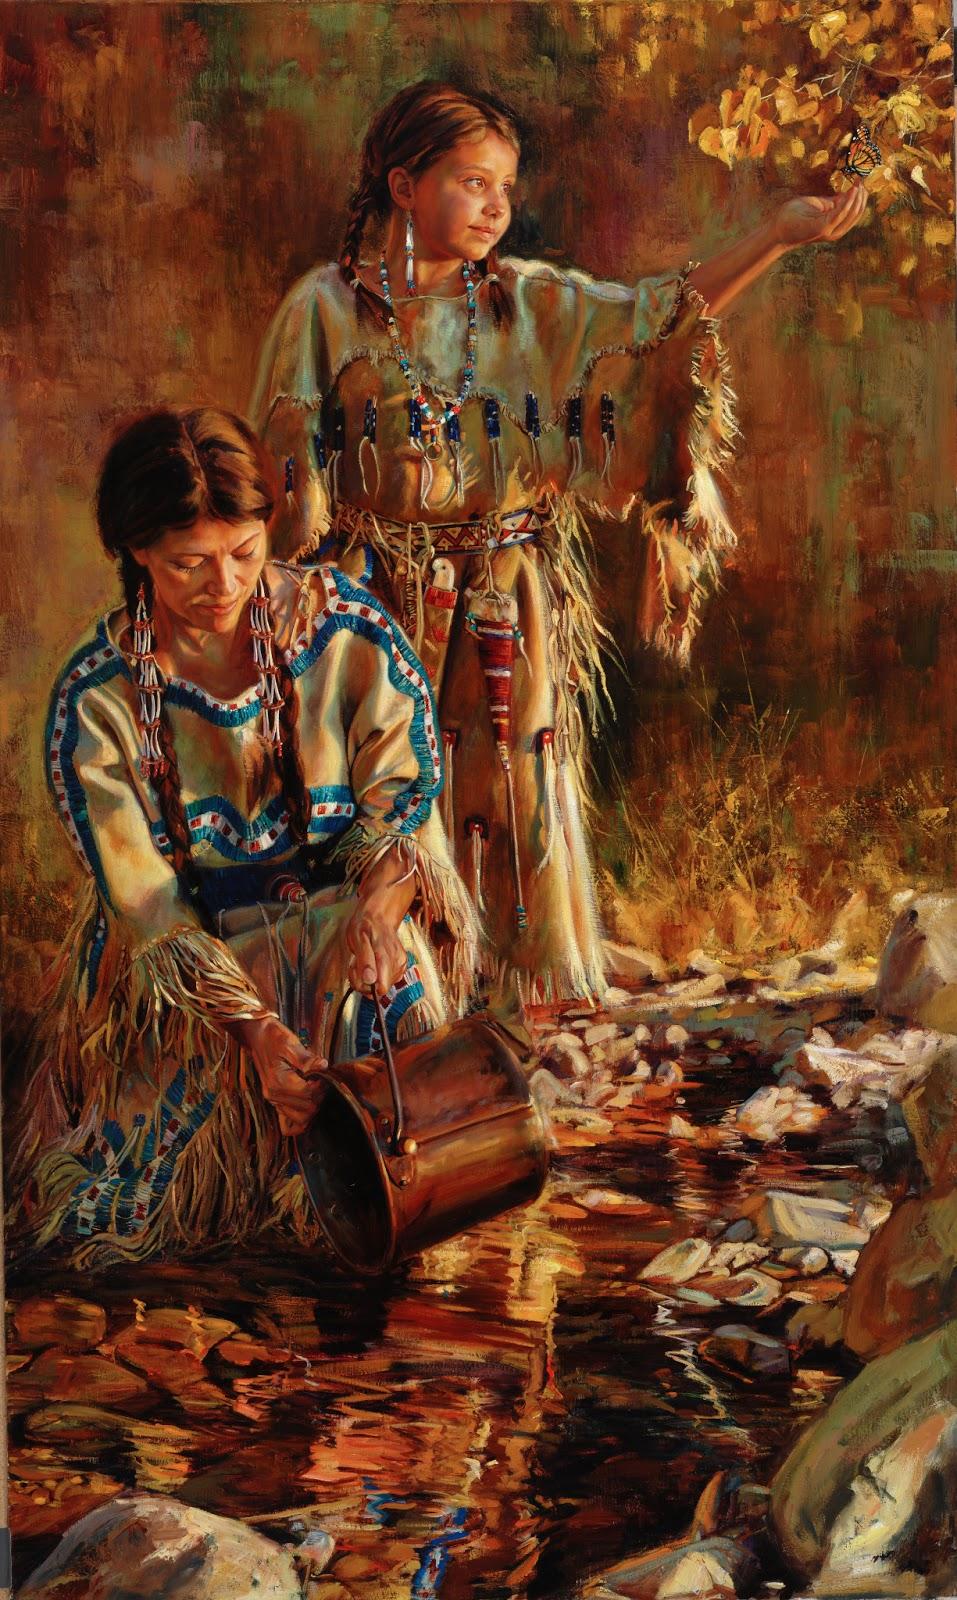 jeremy winborg art original oil paintings western artwork